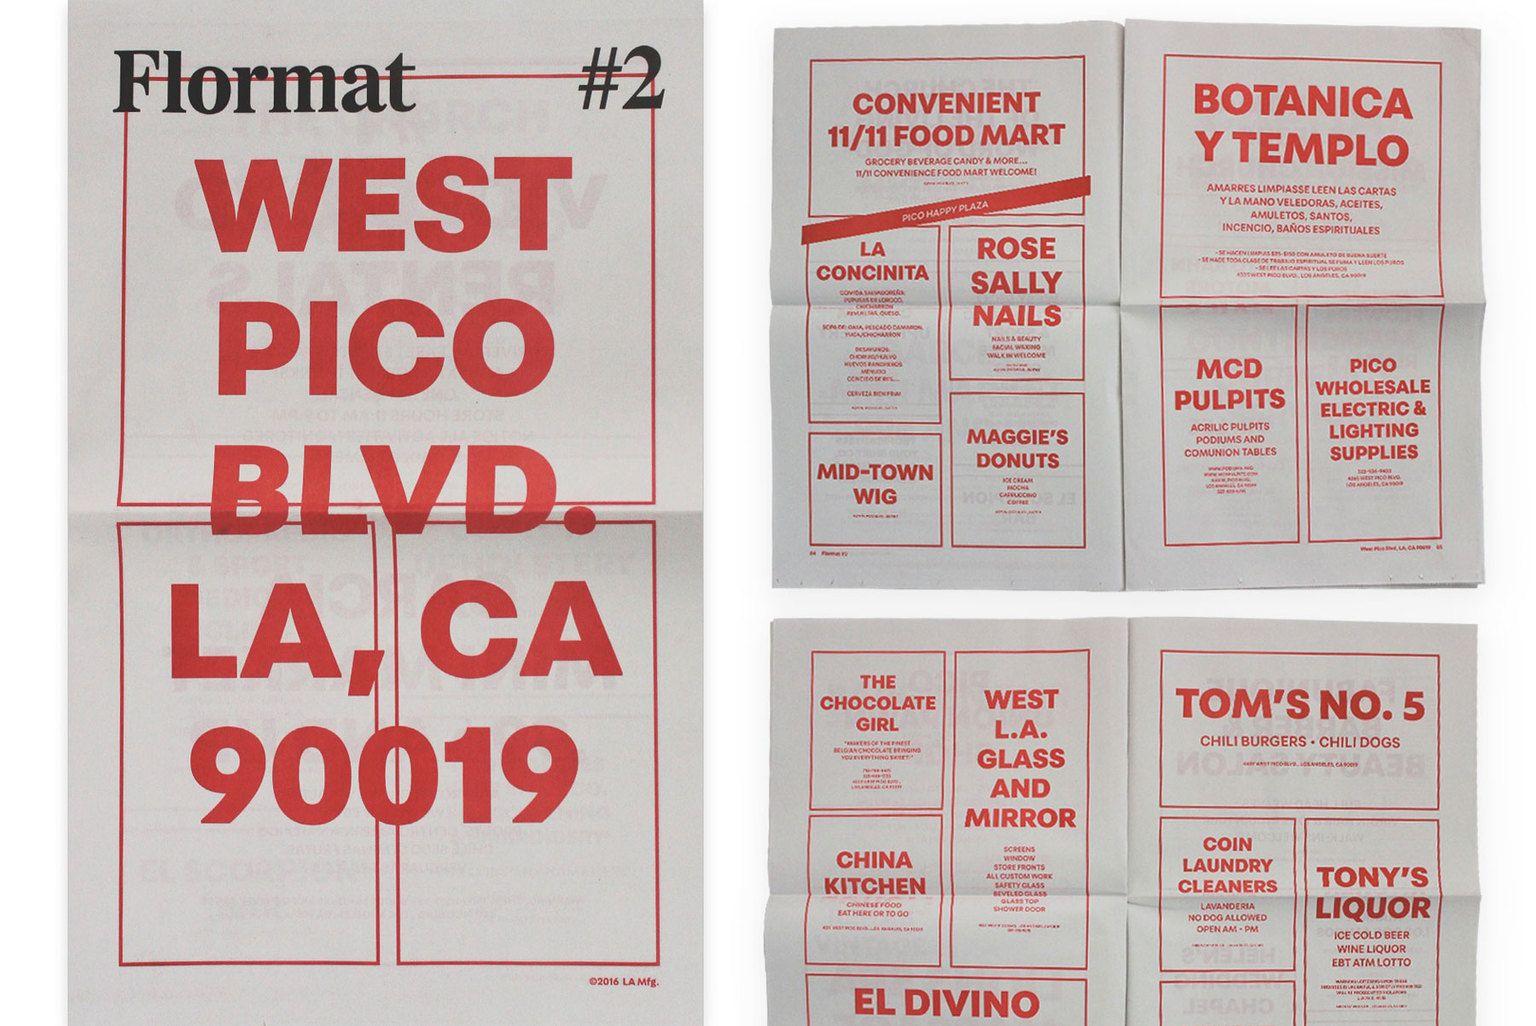 Vllg Luxtypo Fabriga Inuse Book Design Layout Print Packaging Menu Design